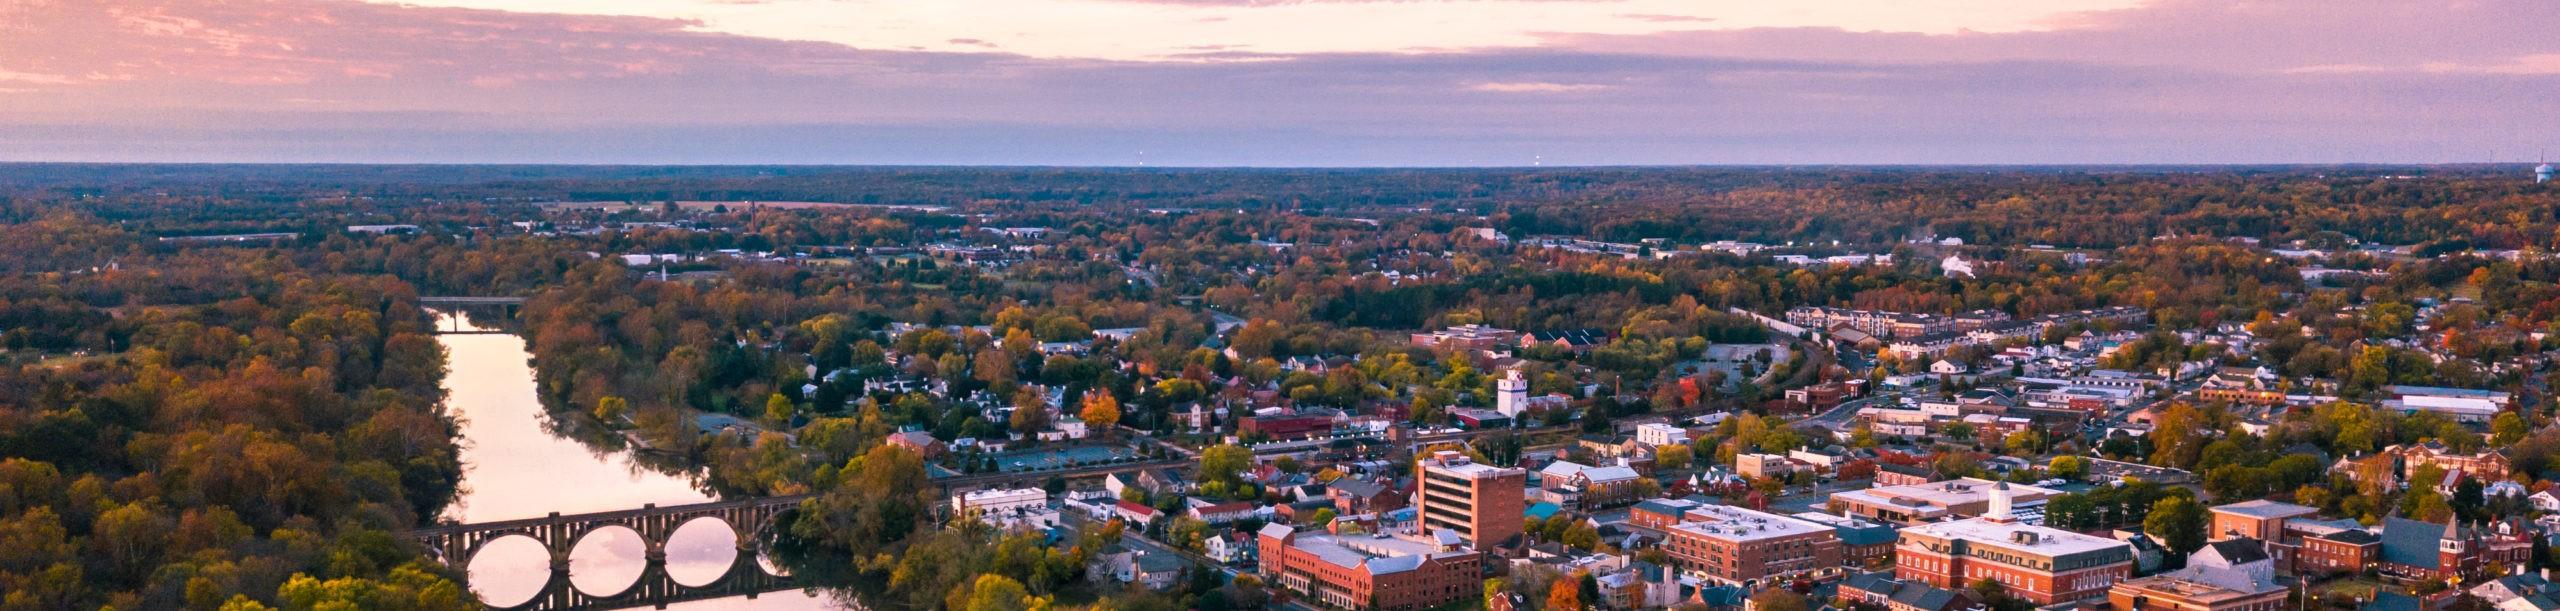 Fredericksburg, VA